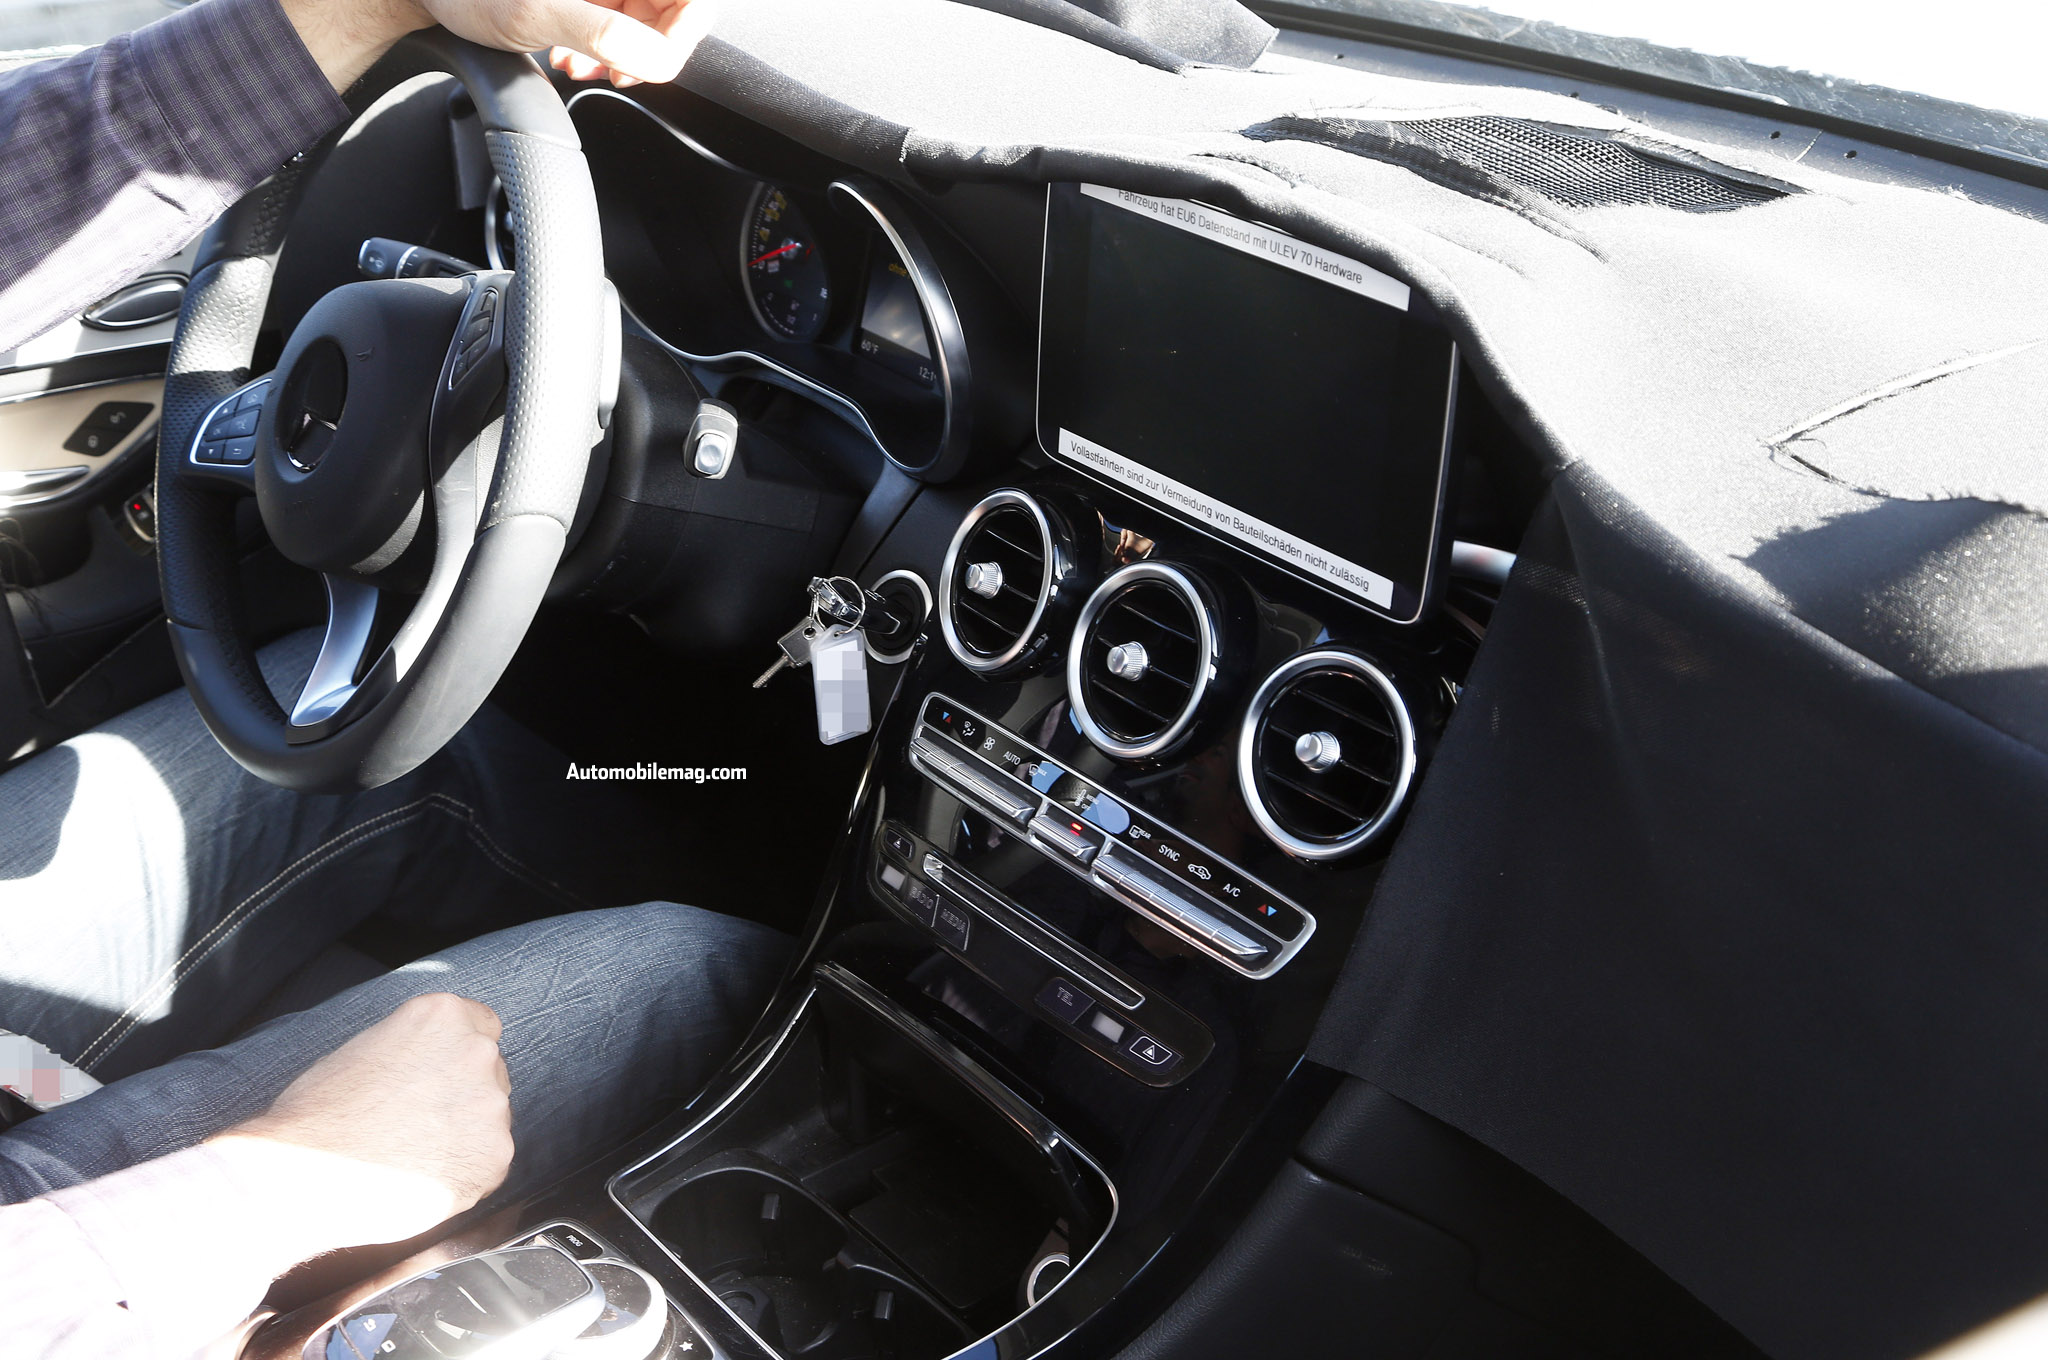 2015 Mercedes-Benz GLK-Class Interior Spied